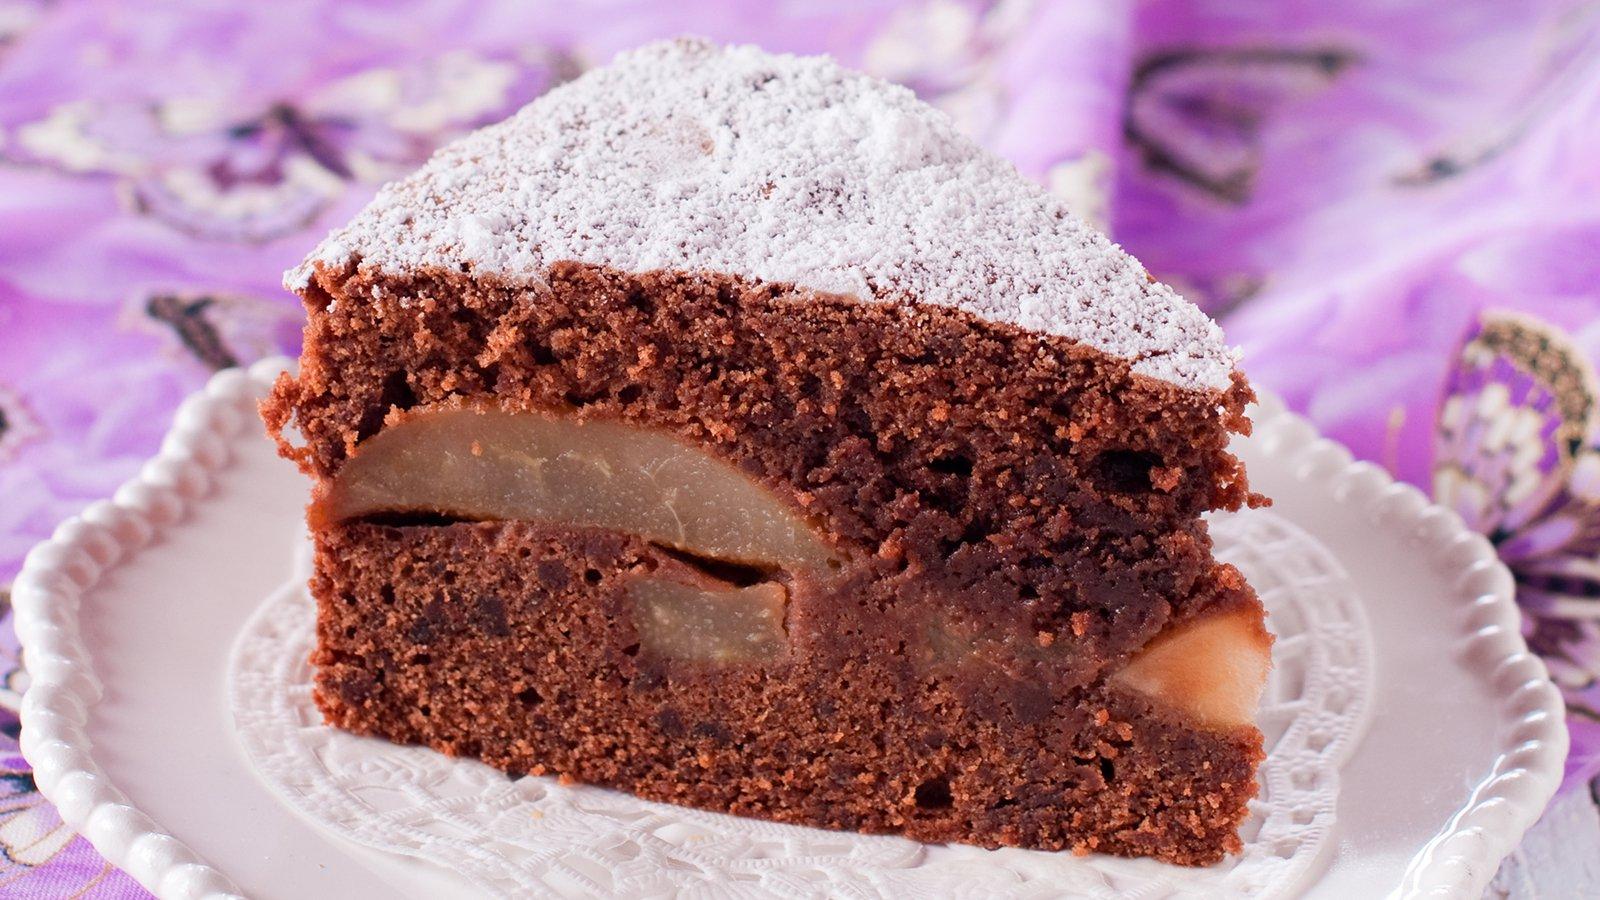 Veganer Schoko Walnuss Birnen Kuchen Rezept Gutekueche De